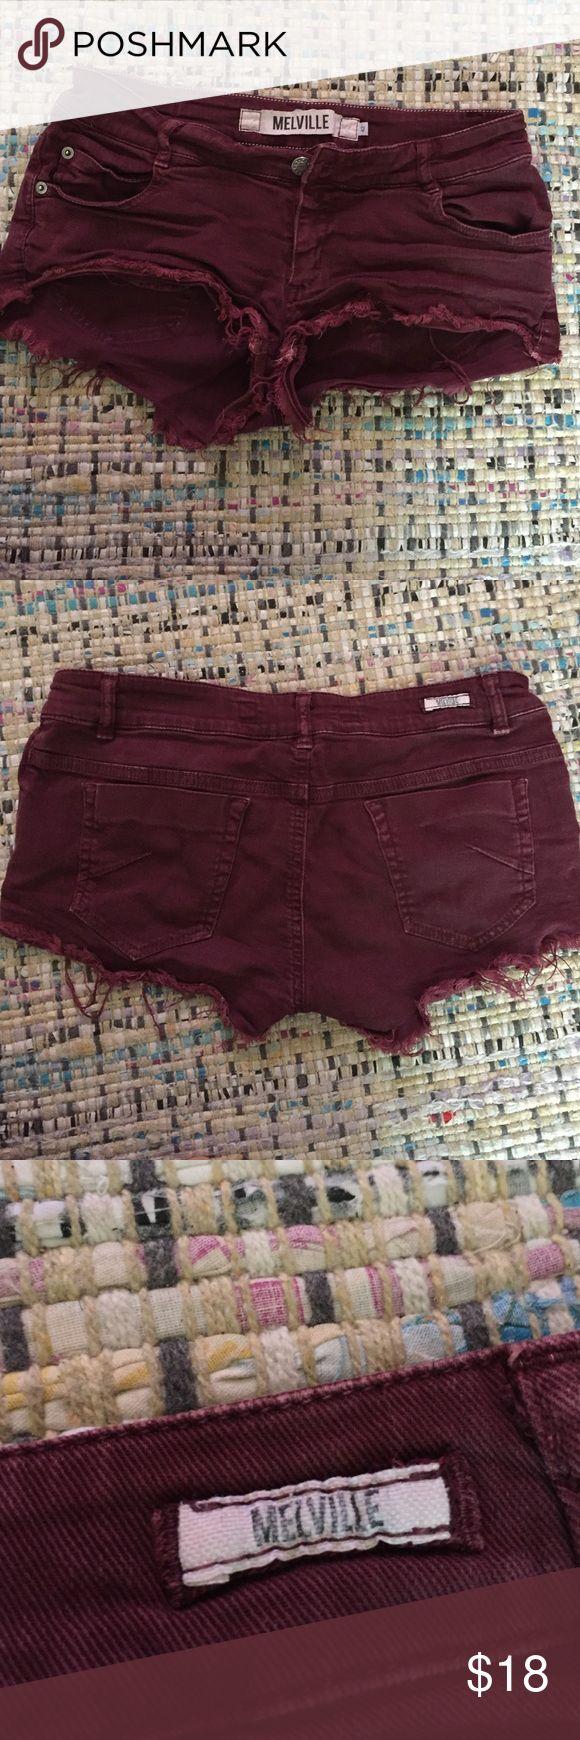 Brandy Melville shorts Brandy Melville maroon jean shorts Brandy Melville Shorts Jean Shorts